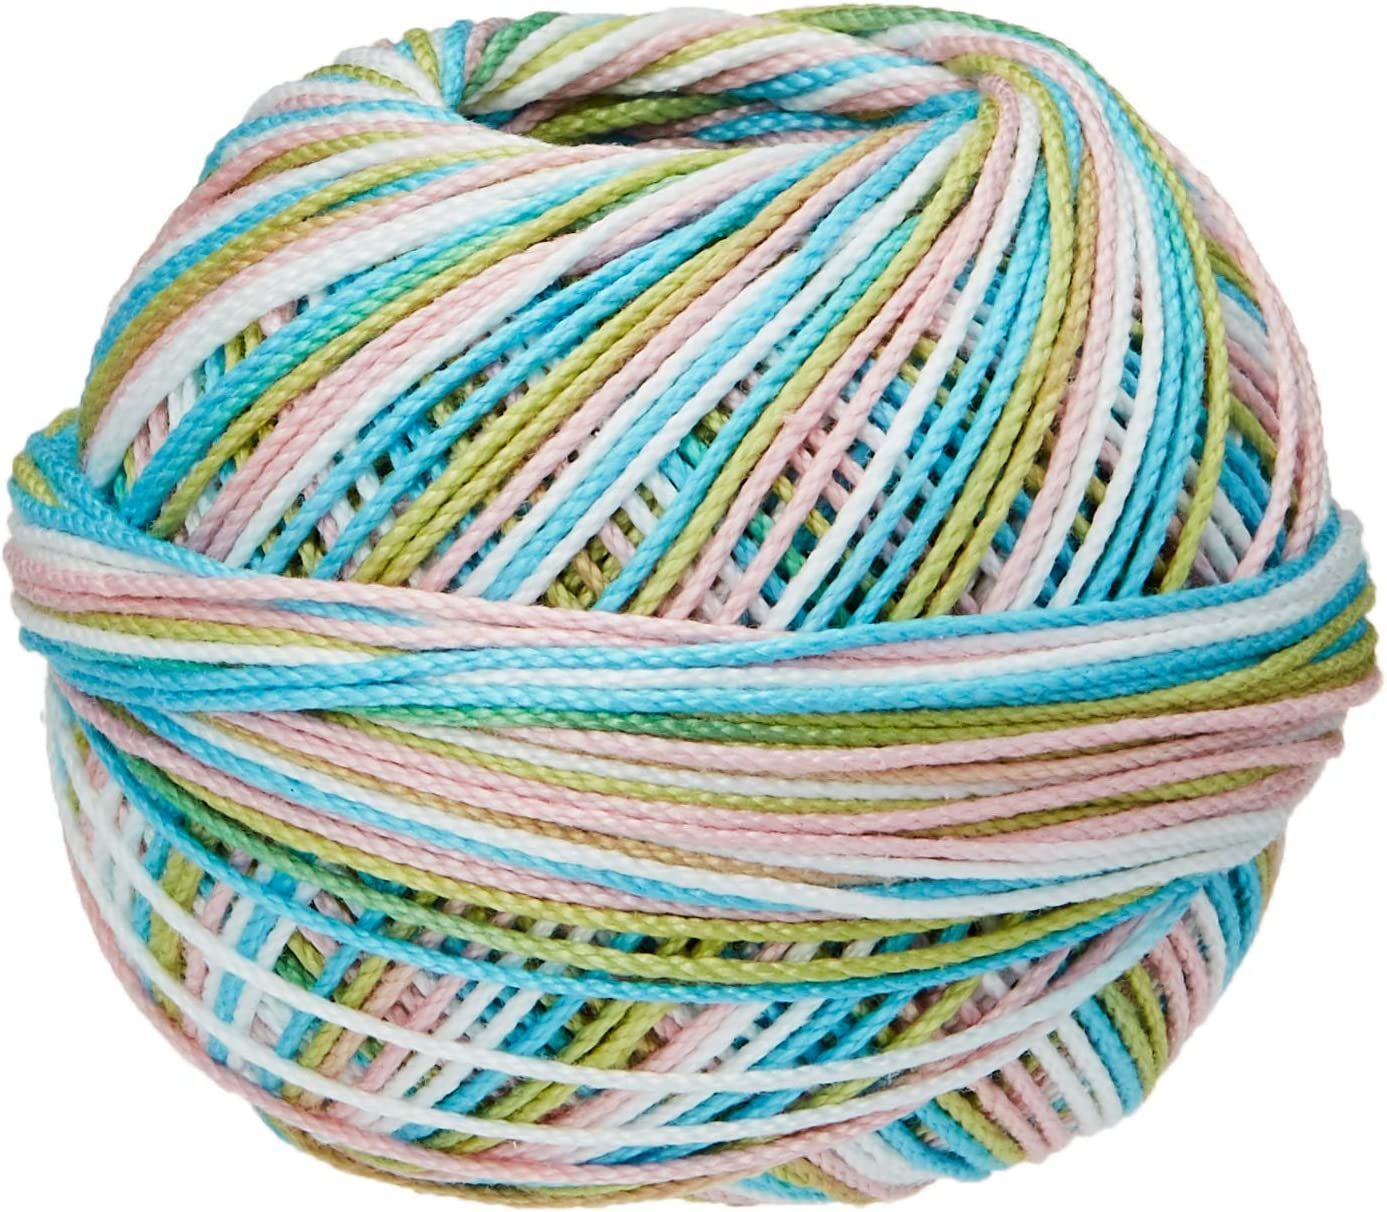 Handy Hands HH03-153 Embroidery Lizbeth Cordonnet Cotton Size 3-Rainbow Taffy